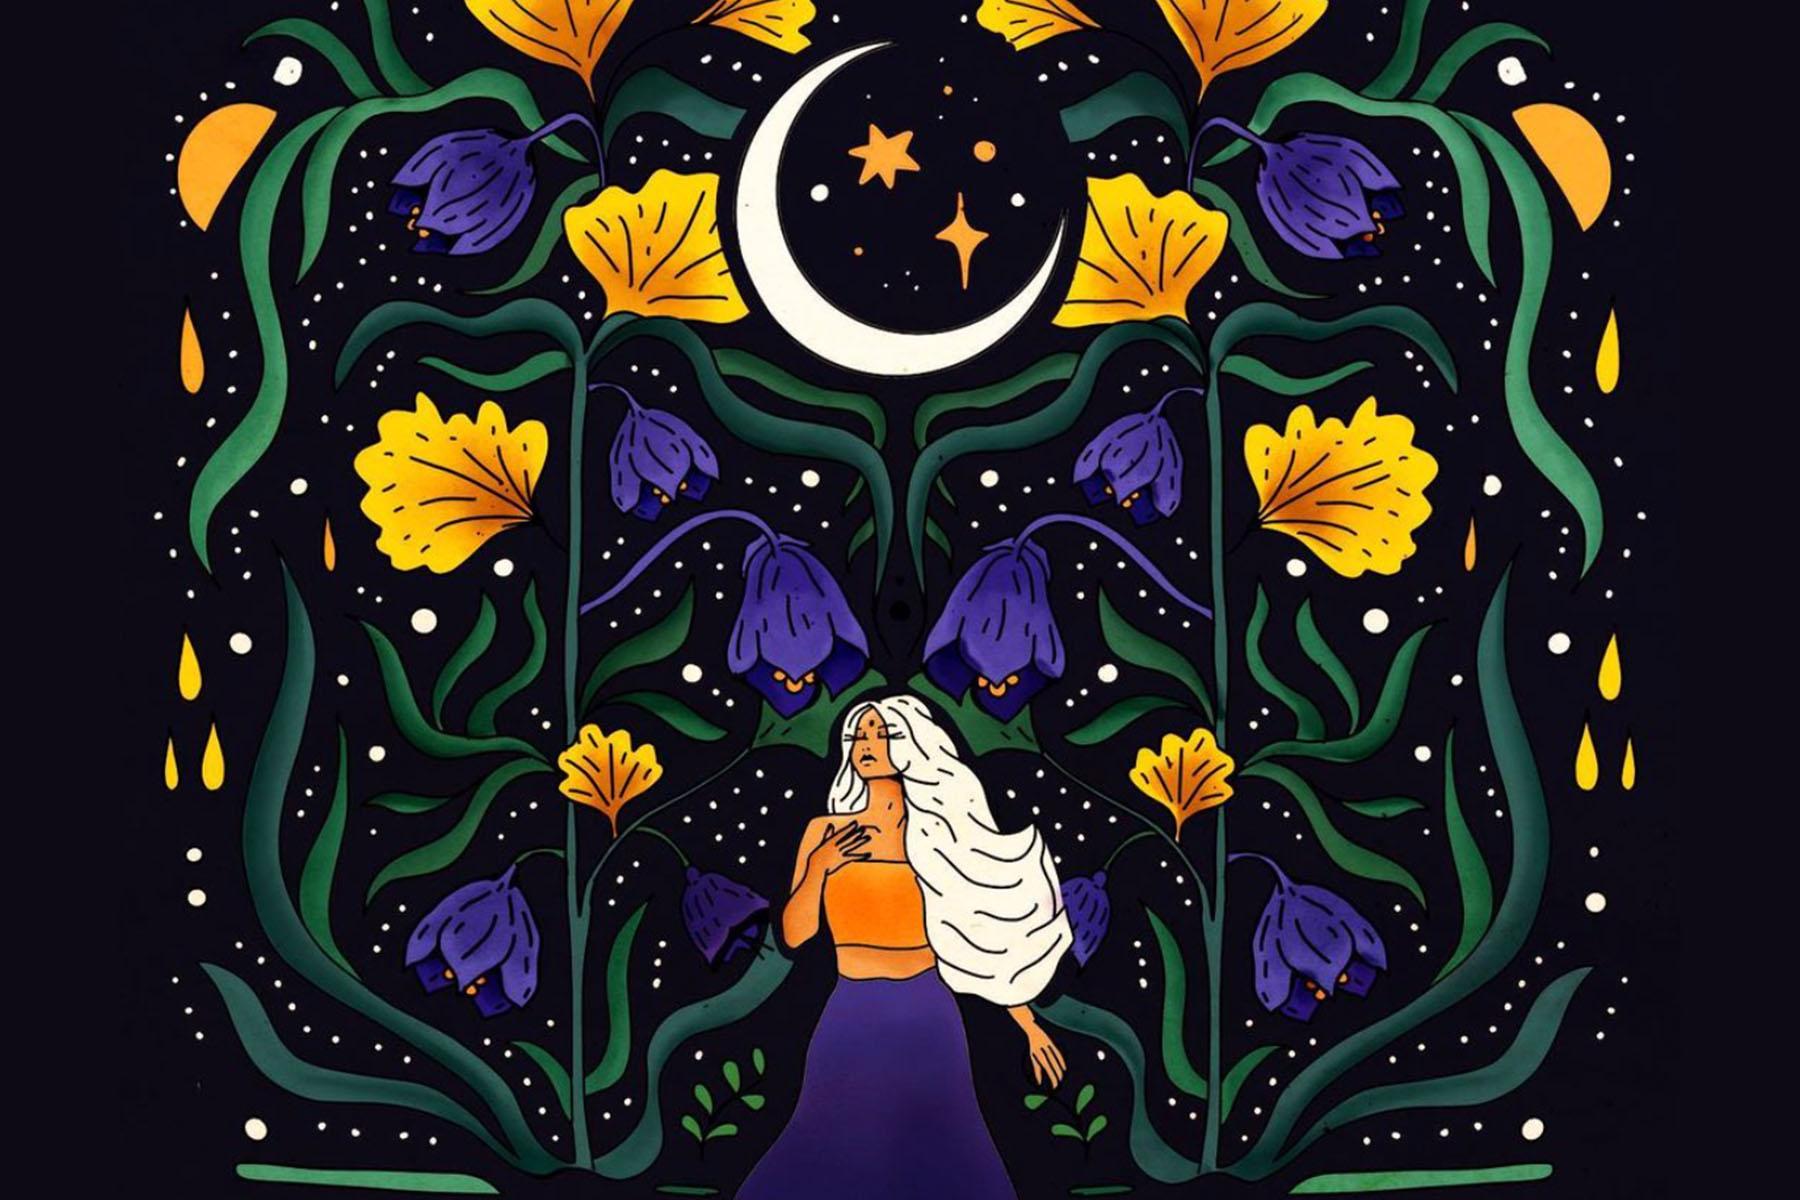 Weekly Horoscope: July 5-11, 2021